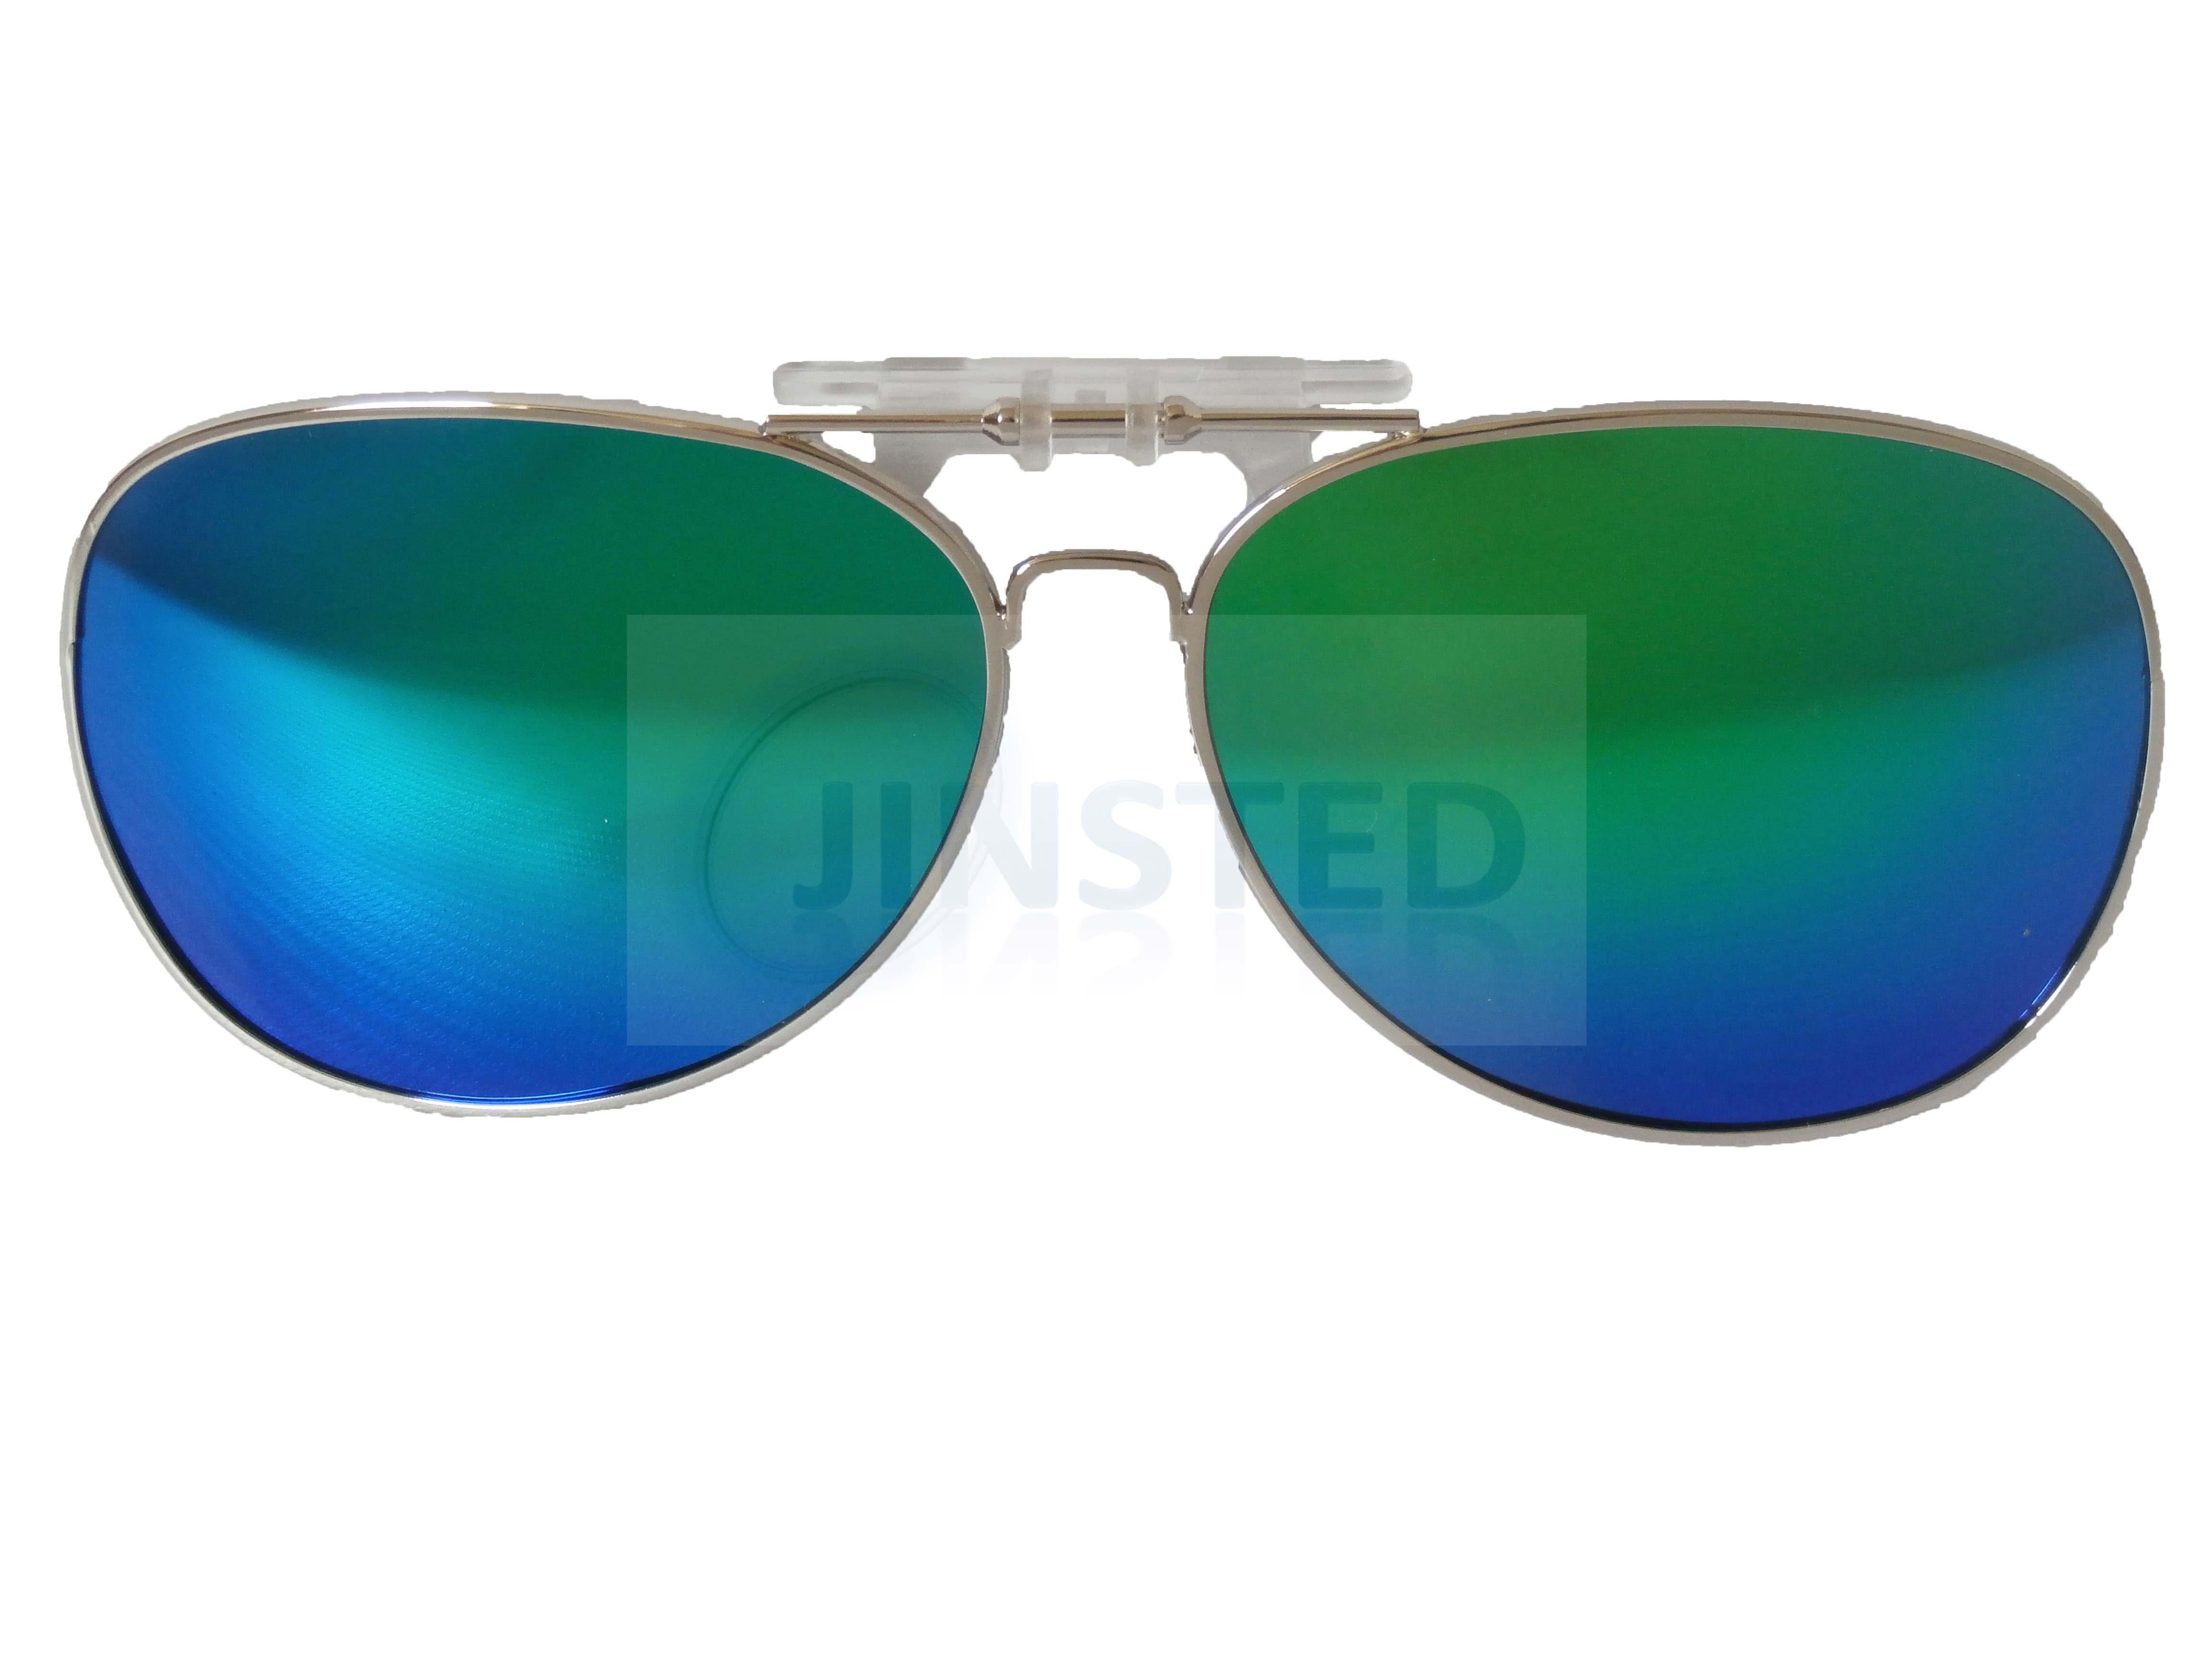 83b04e324e Green Mirrored Pilot Sunglasses Polarised Polarized Clip On Shades ...